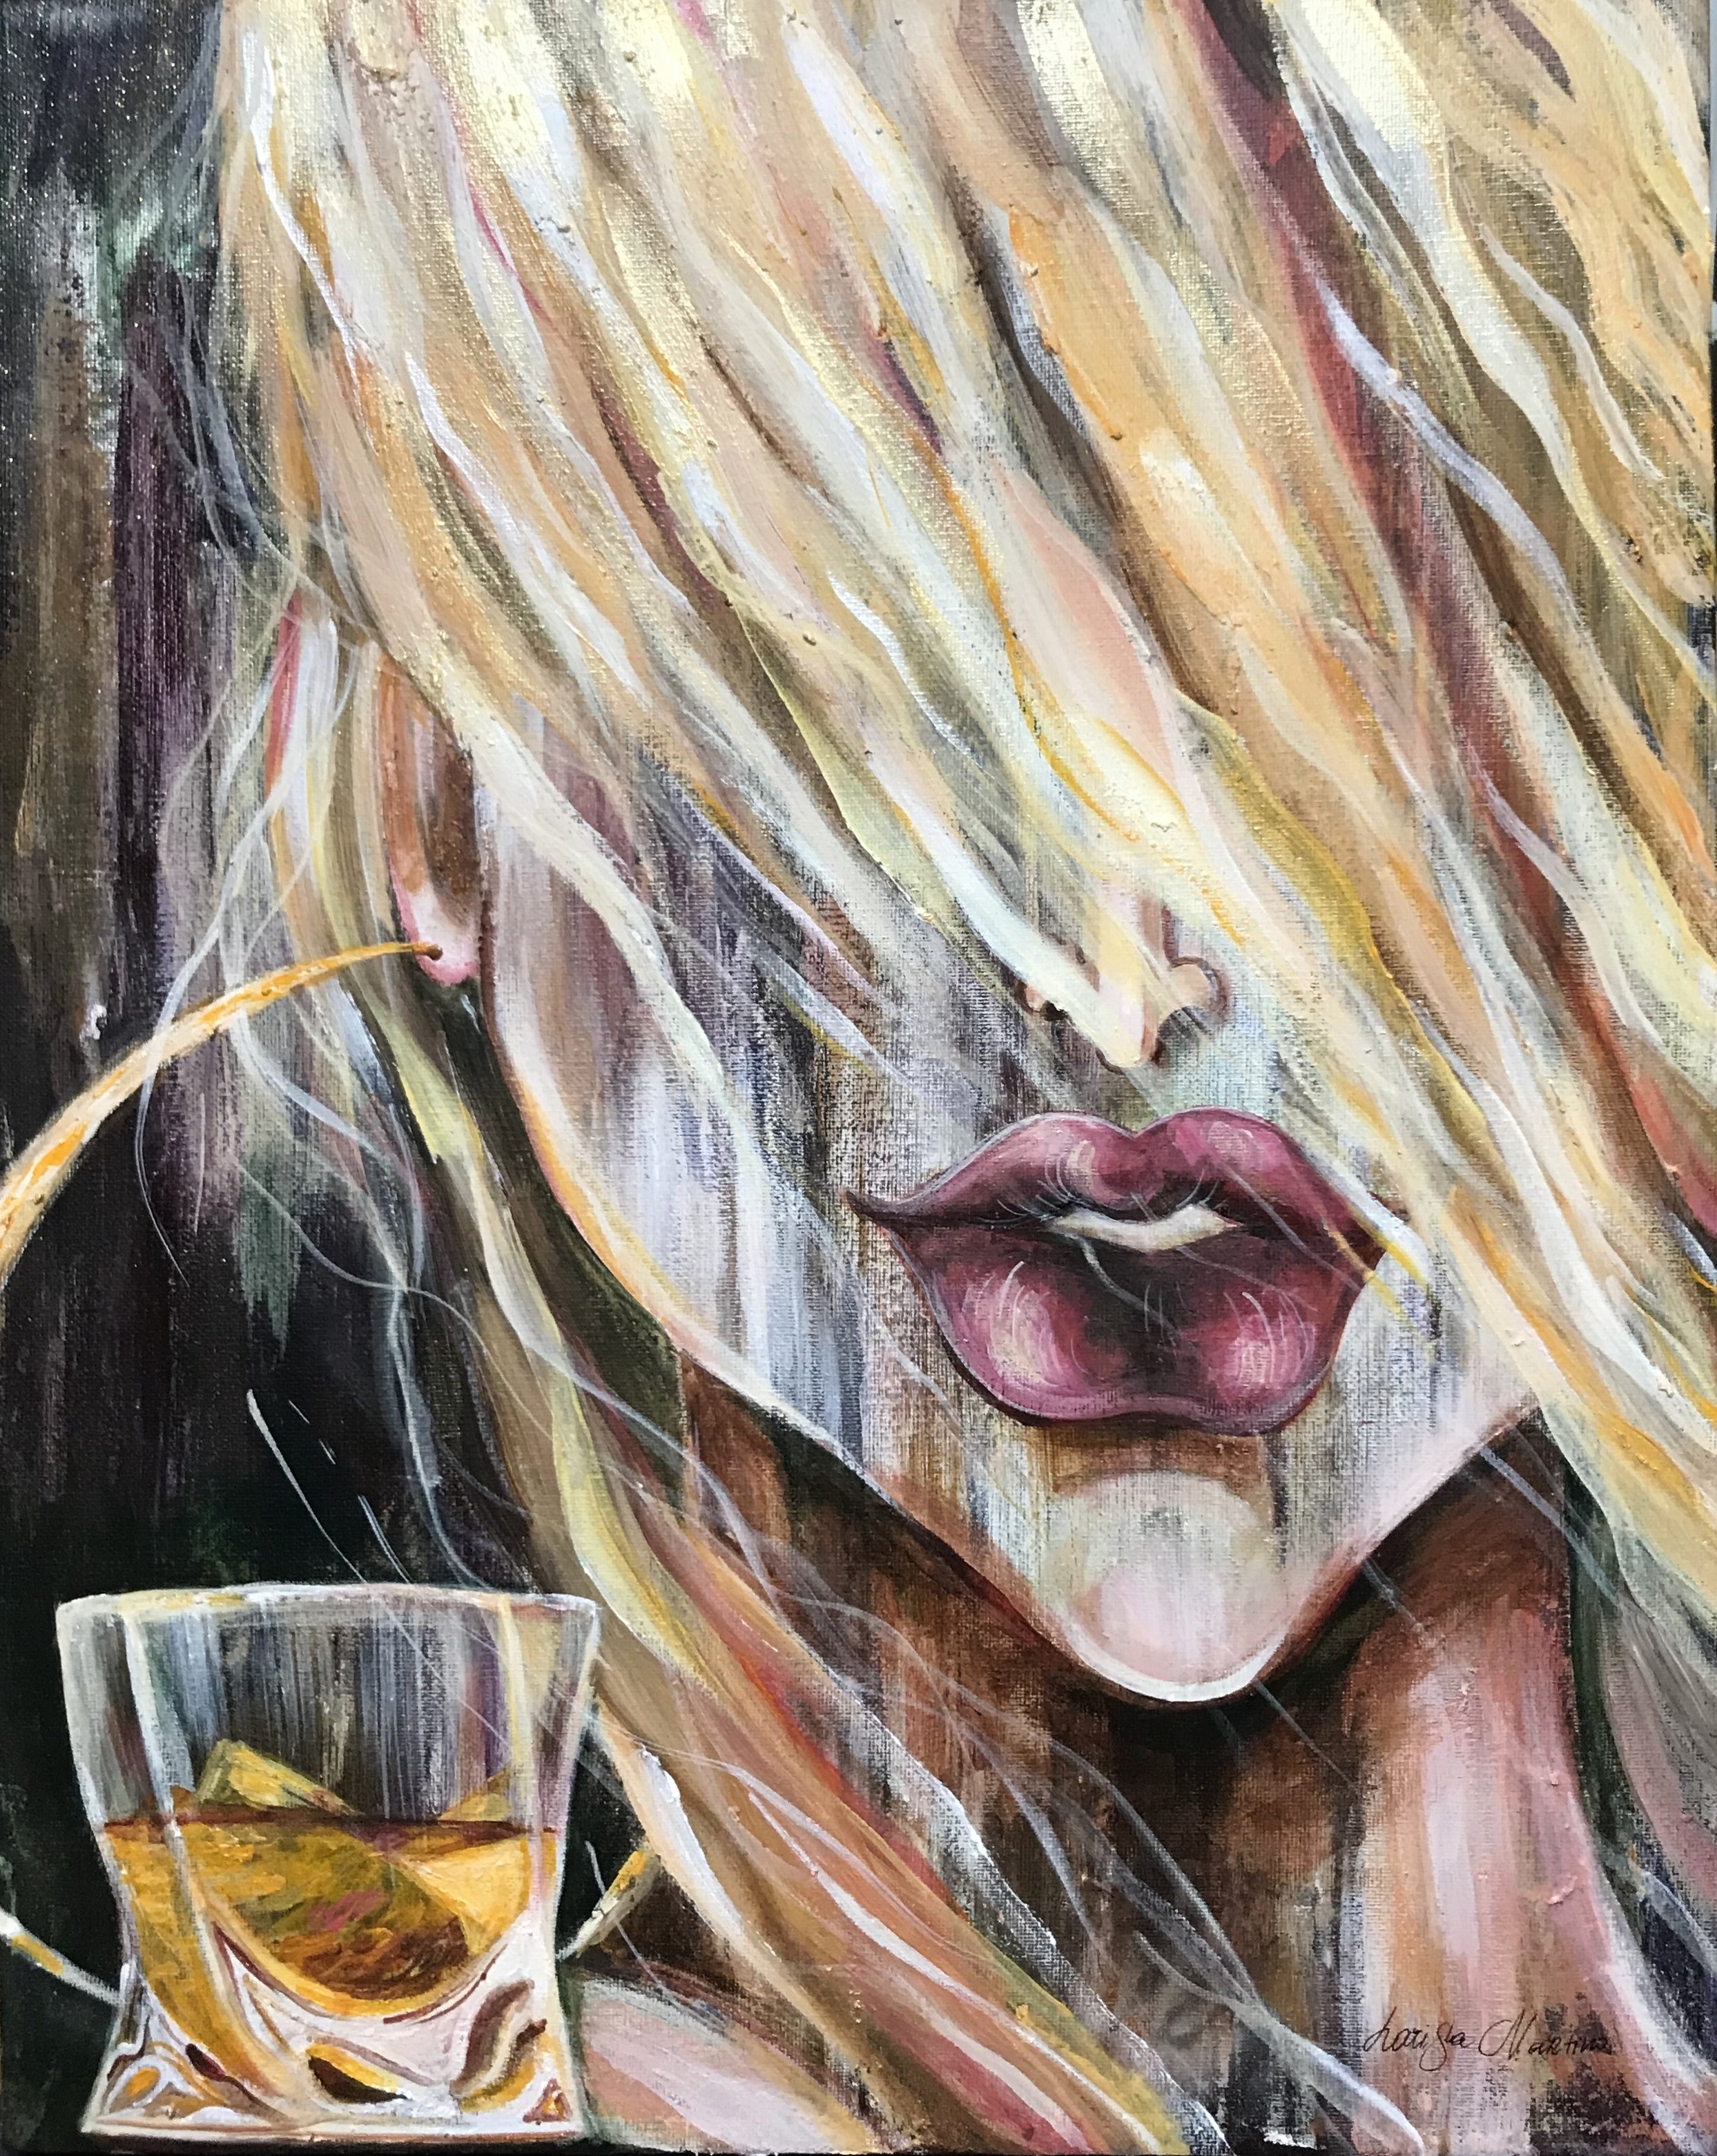 Scotch Girl- 16X20. Sold.